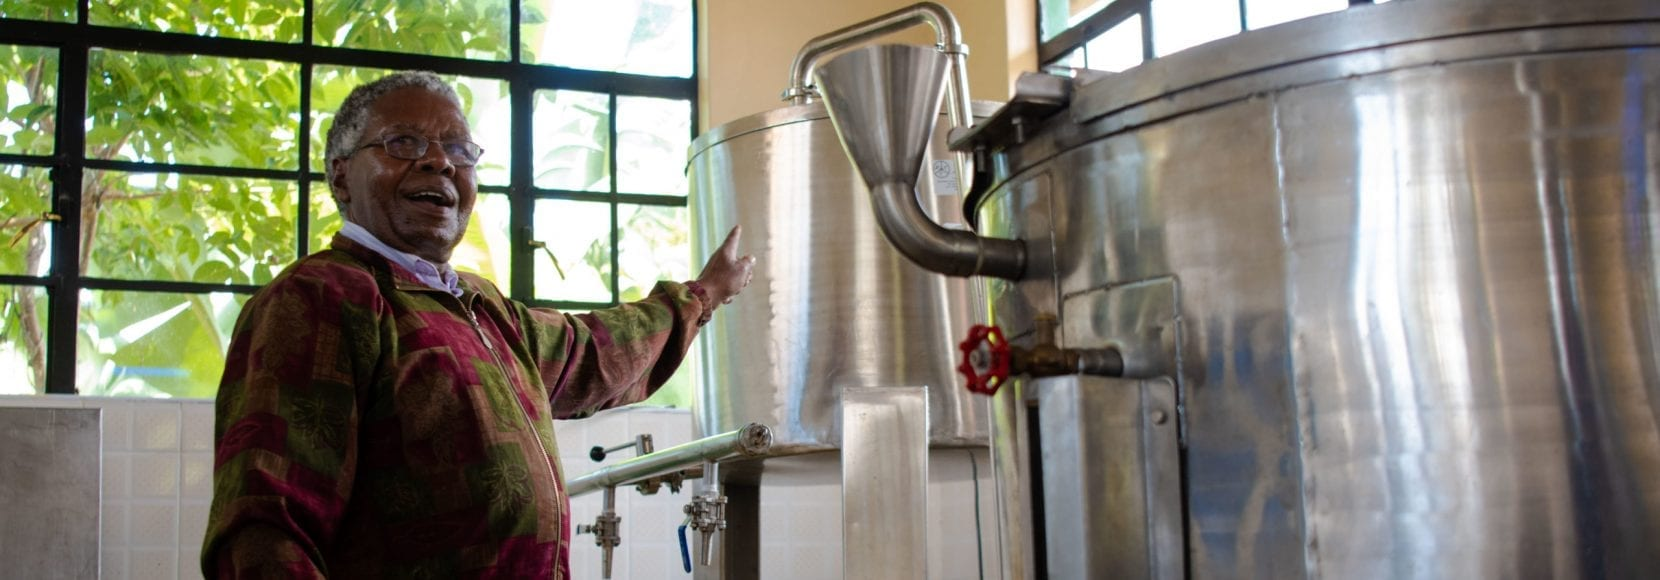 Man processing drinks